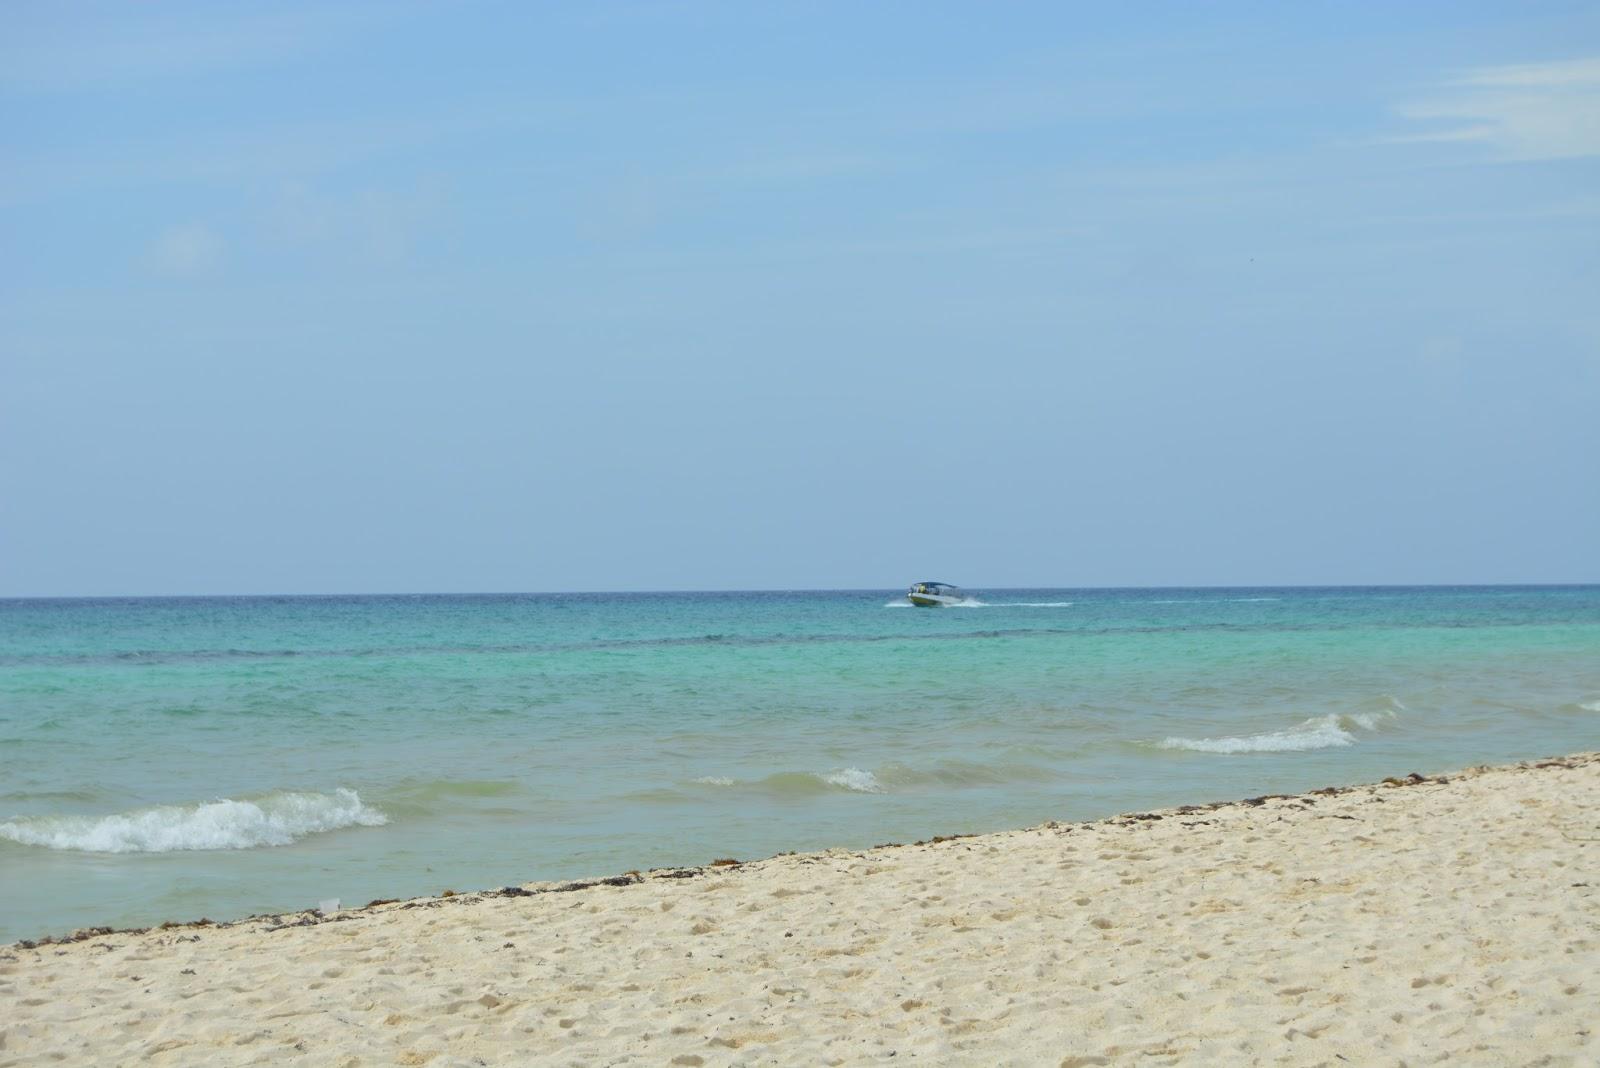 beaches, sea, ocean, caribbean sea, mexico, playa del carmen, playacar, travel, traveling